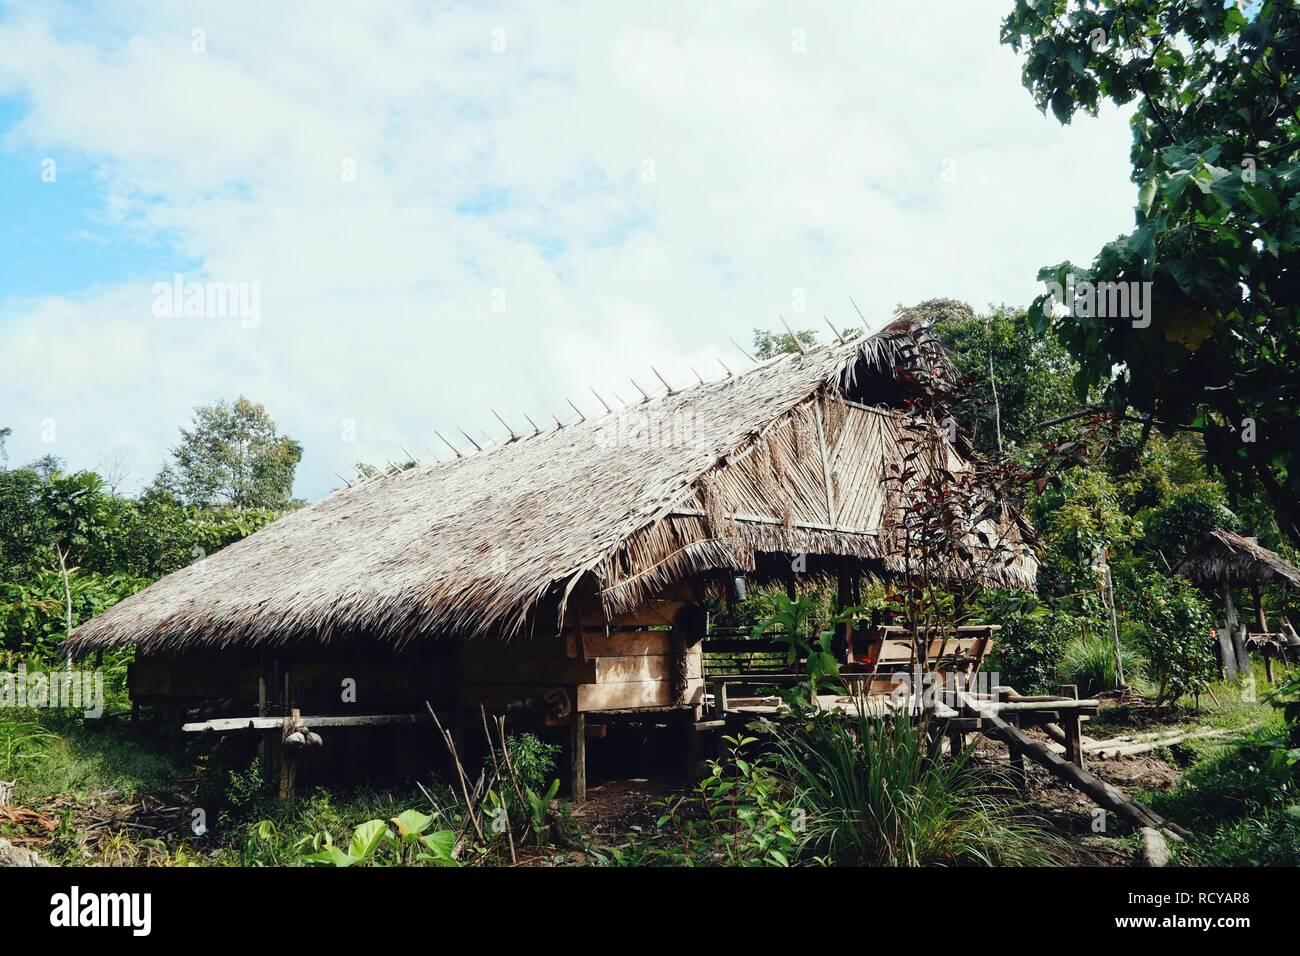 Muara Siberut, Mentawai Islands / Indonesia - Aug 15 2017: tribal jungle home - Stock Image